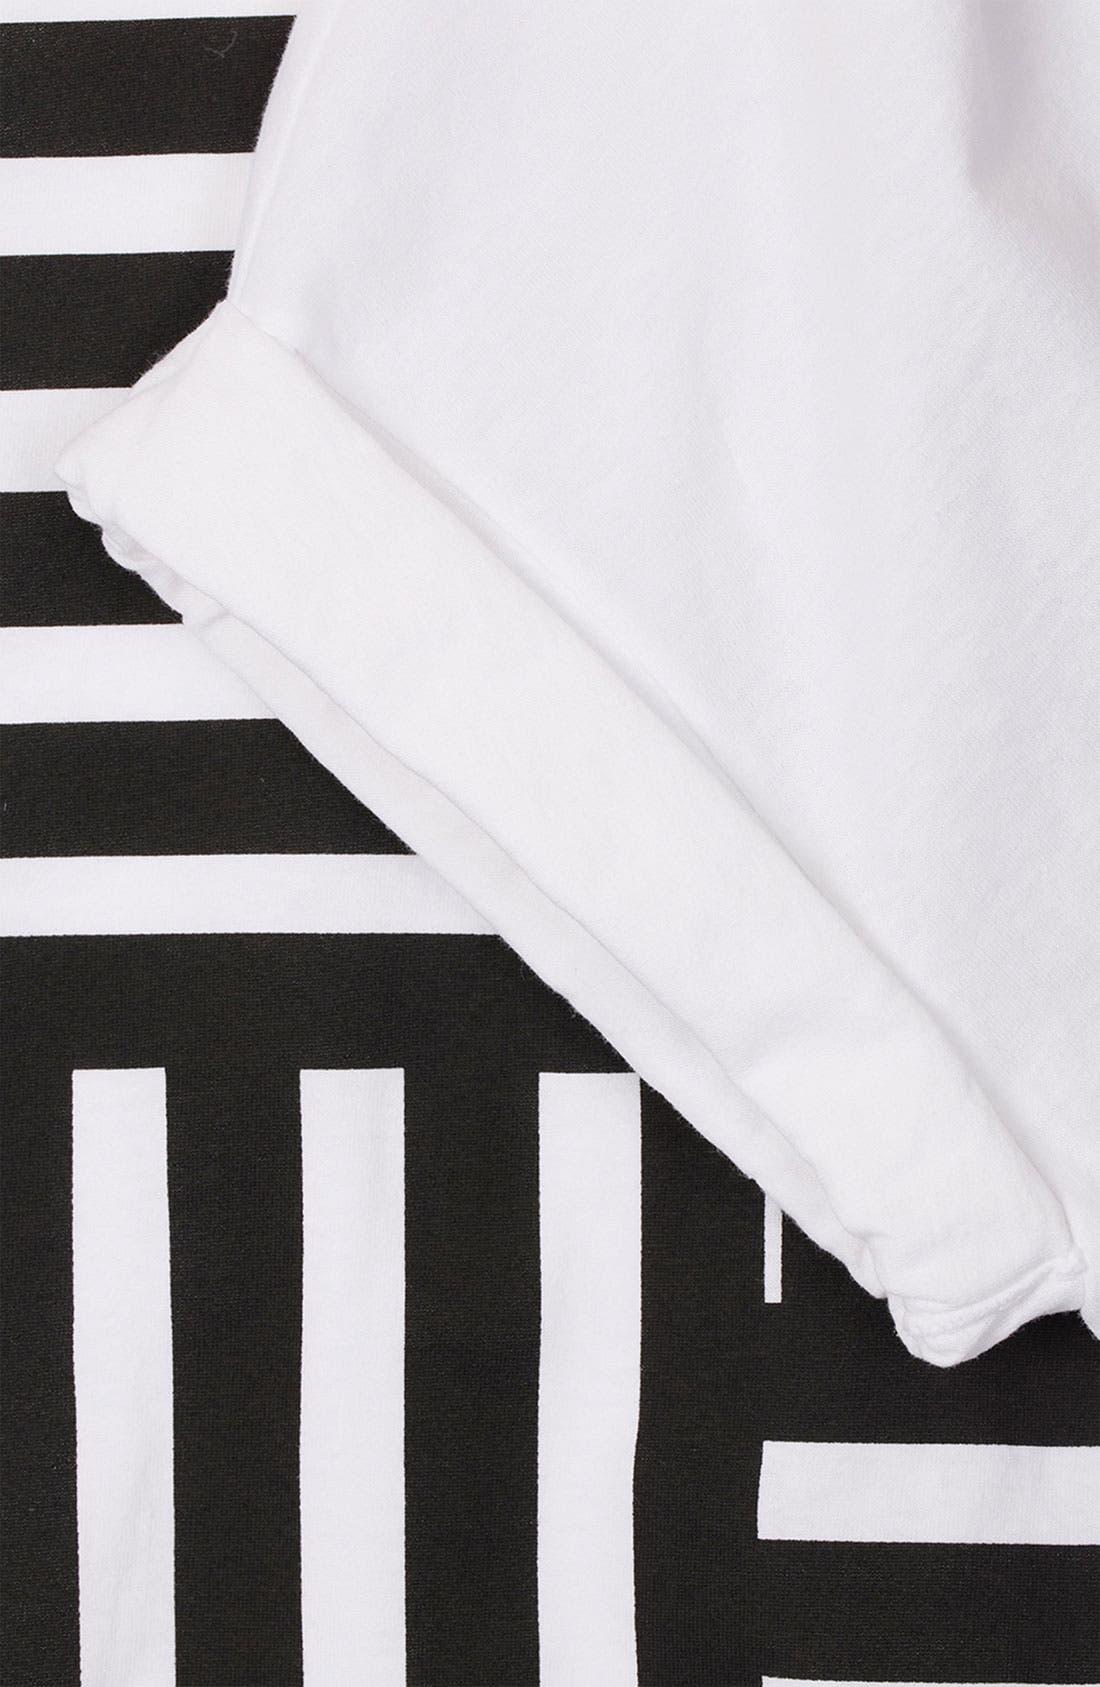 Elemental Stripe Graphic Tee,                             Alternate thumbnail 2, color,